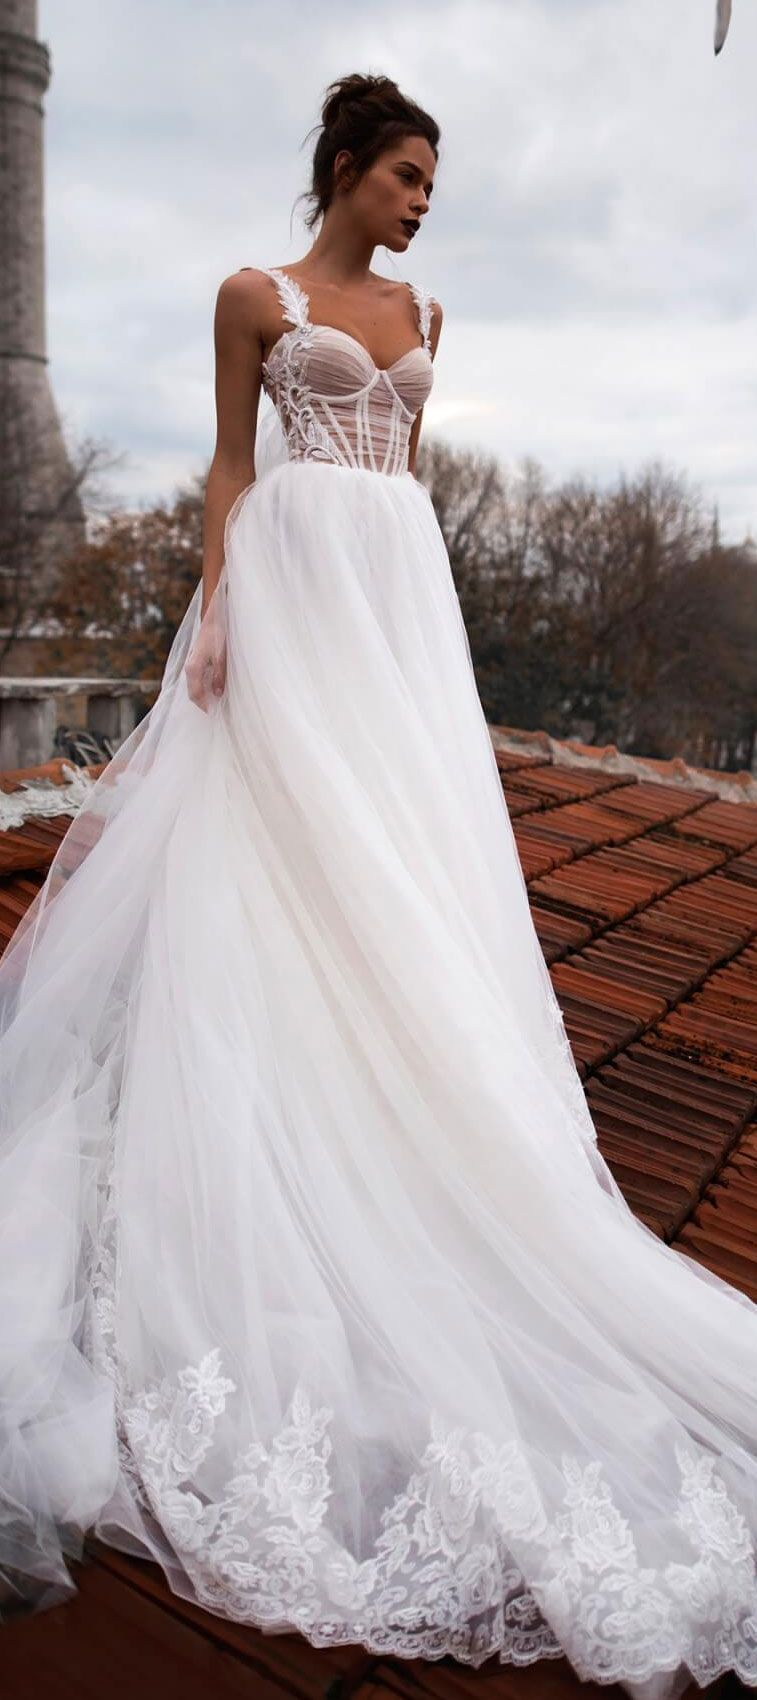 Sleeveless sweetheart neckline tulle skirt a line wedding dress #weddingdress #weddinggown #bridedress #bridalgown